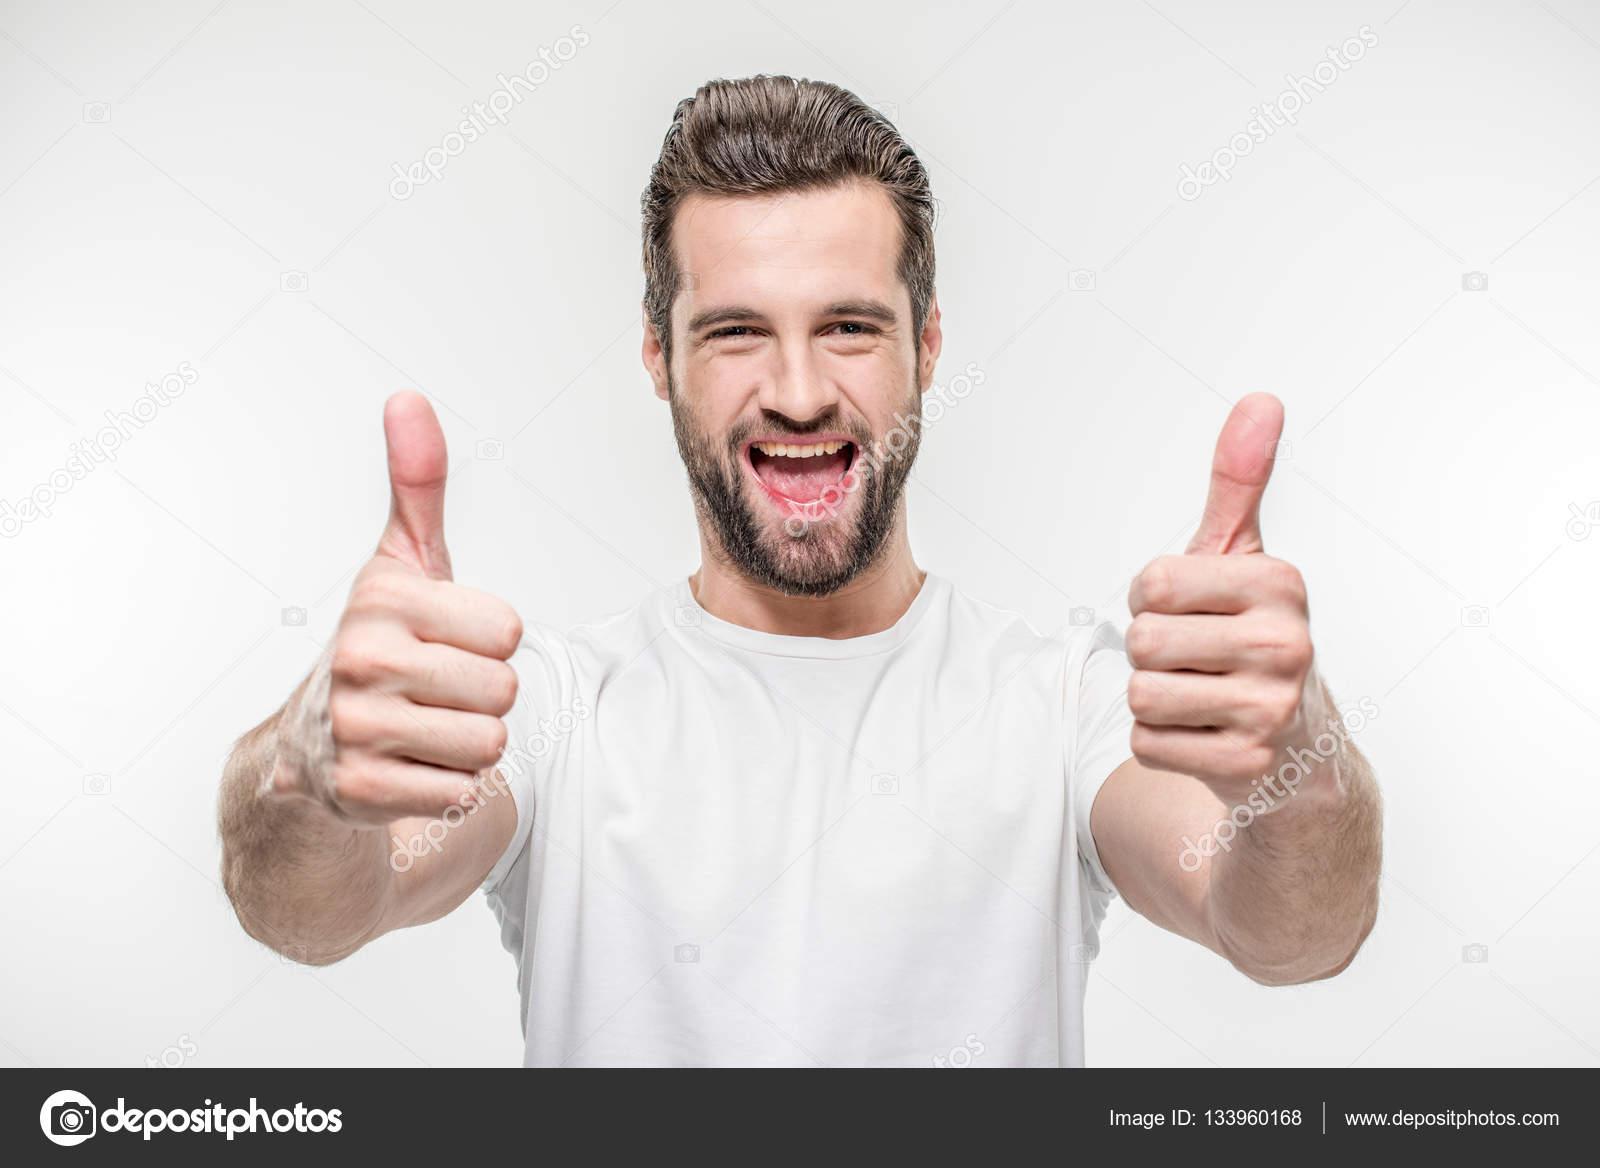 Manchester united thumb thumb image